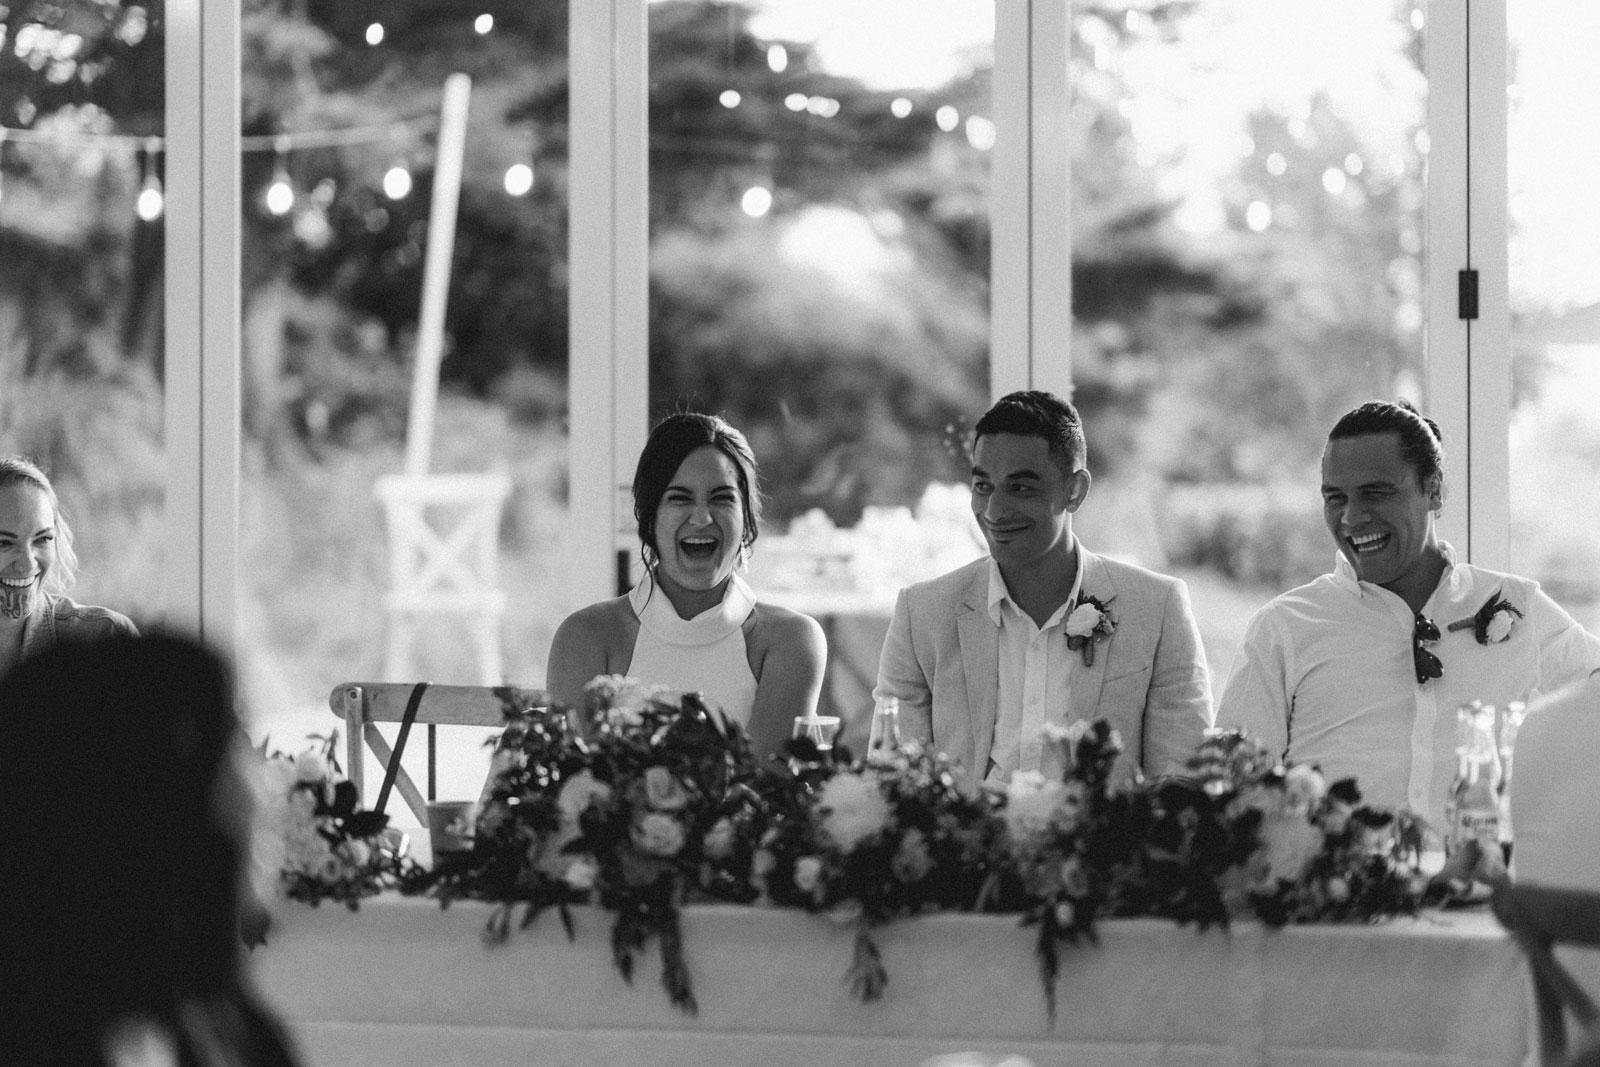 newfound-n-w-black-barn-tarawera-rotorua-wedding-photographer-943A